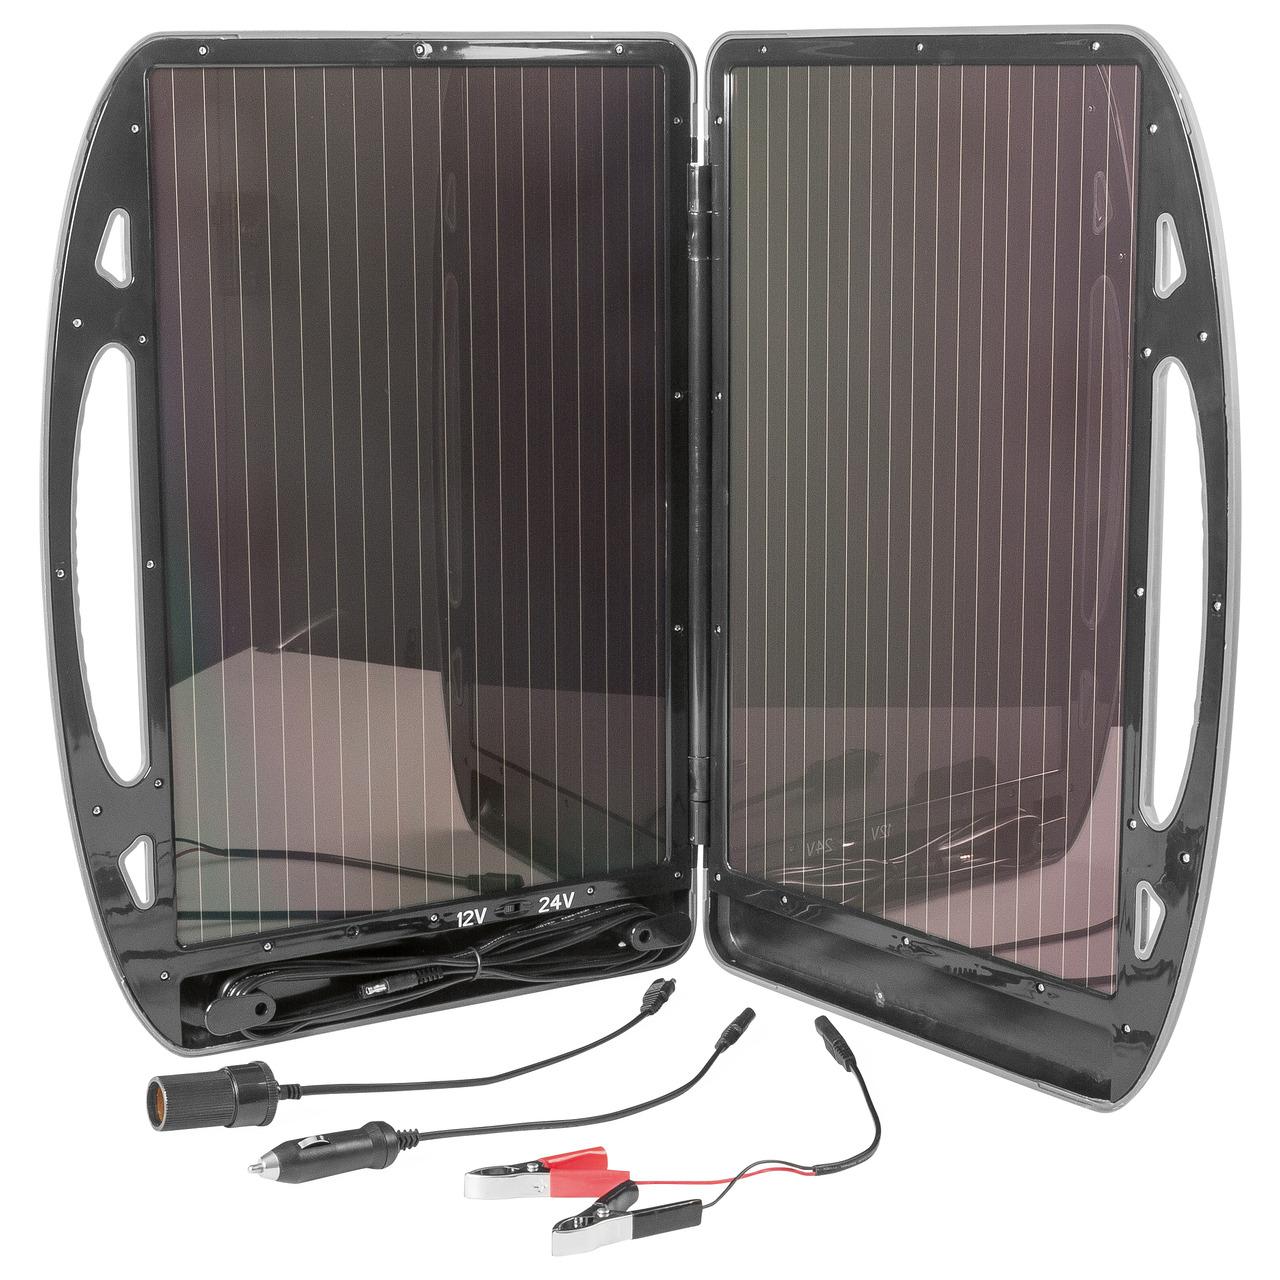 ELV Mobiler Solar-Lader- 12-24V- 13 W